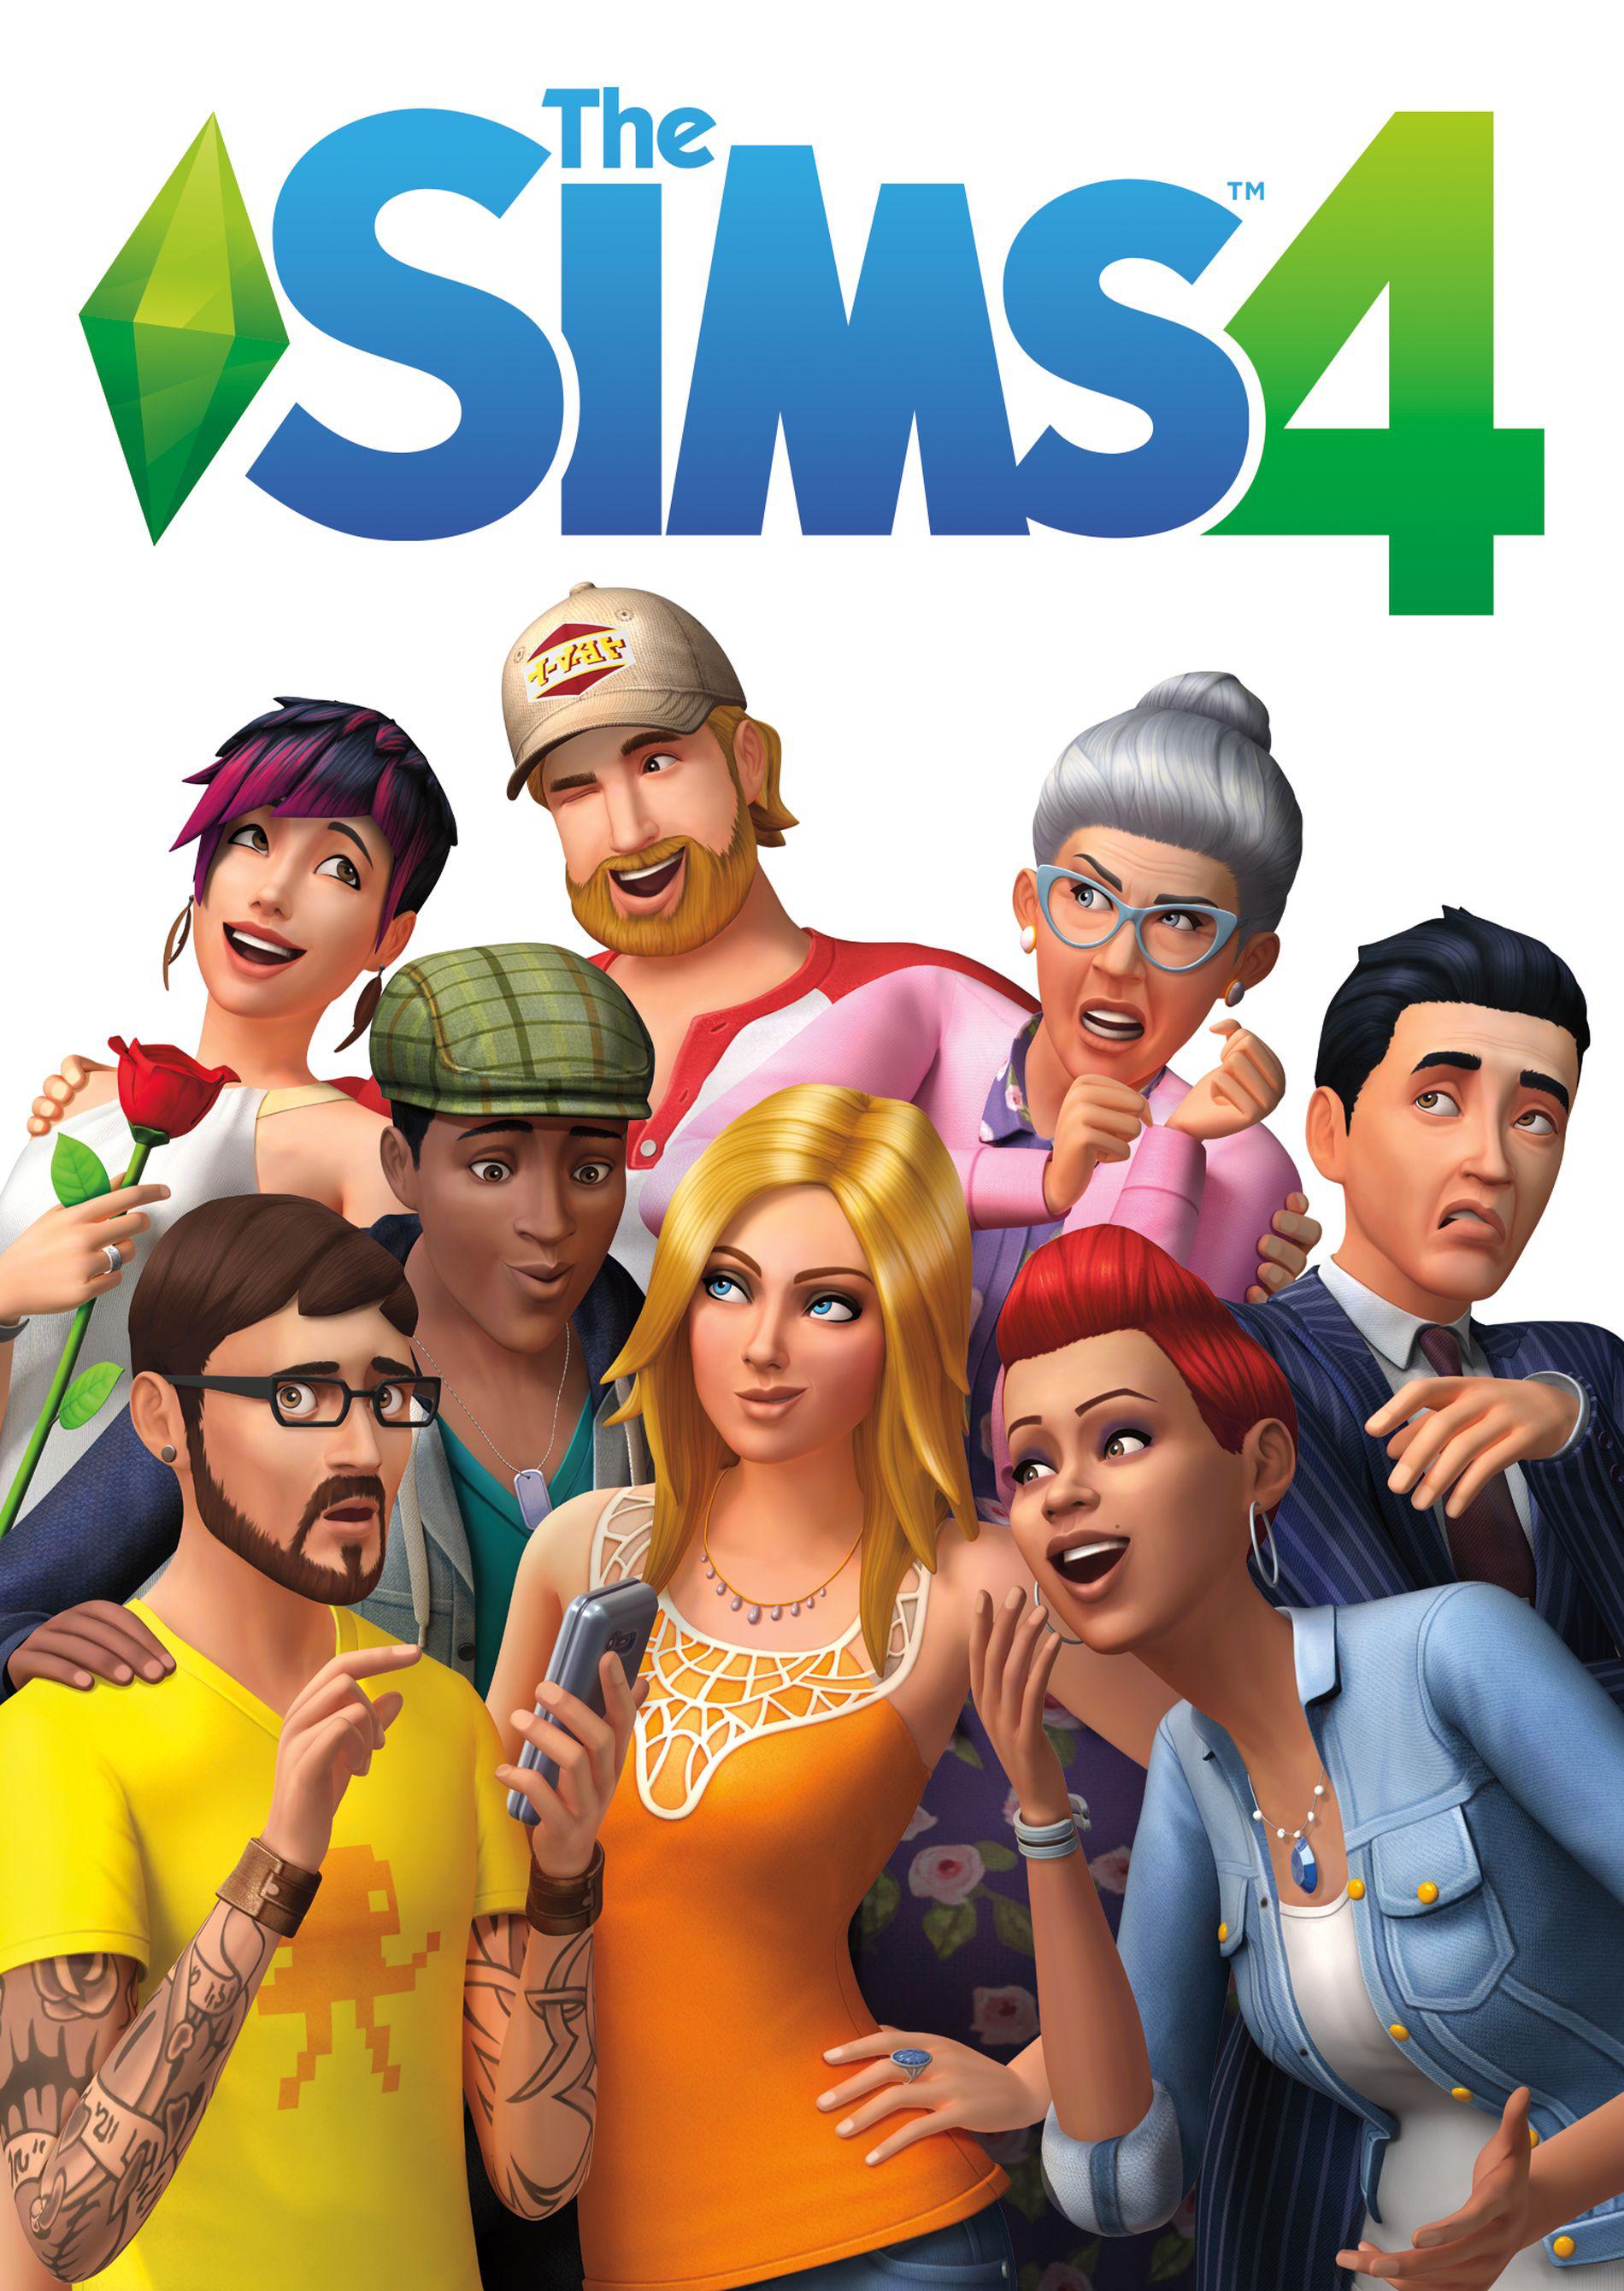 The Sims 4 | Simspedia | Fandom powered by Wikia